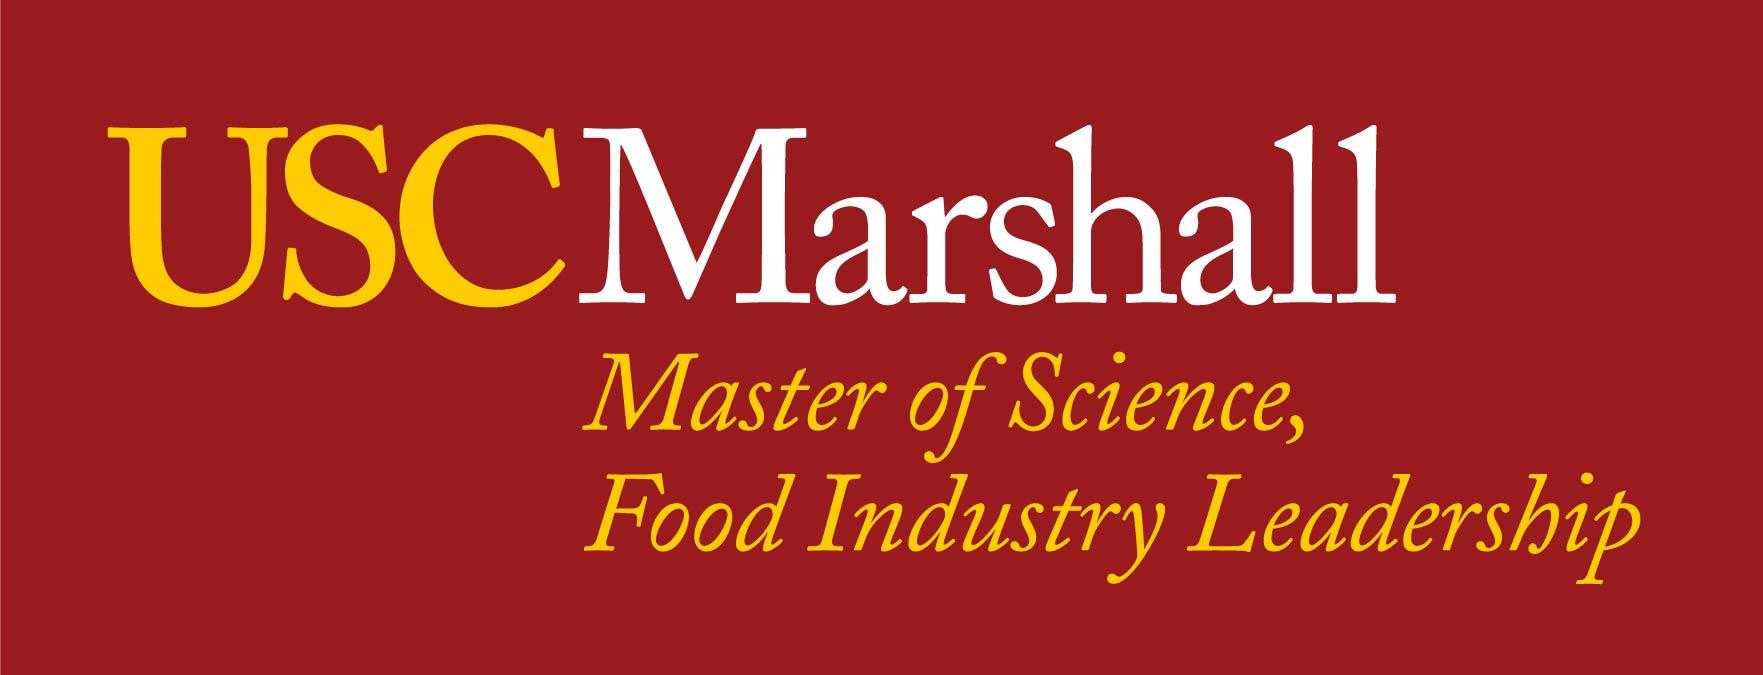 Informal marshall msfil goldoncard